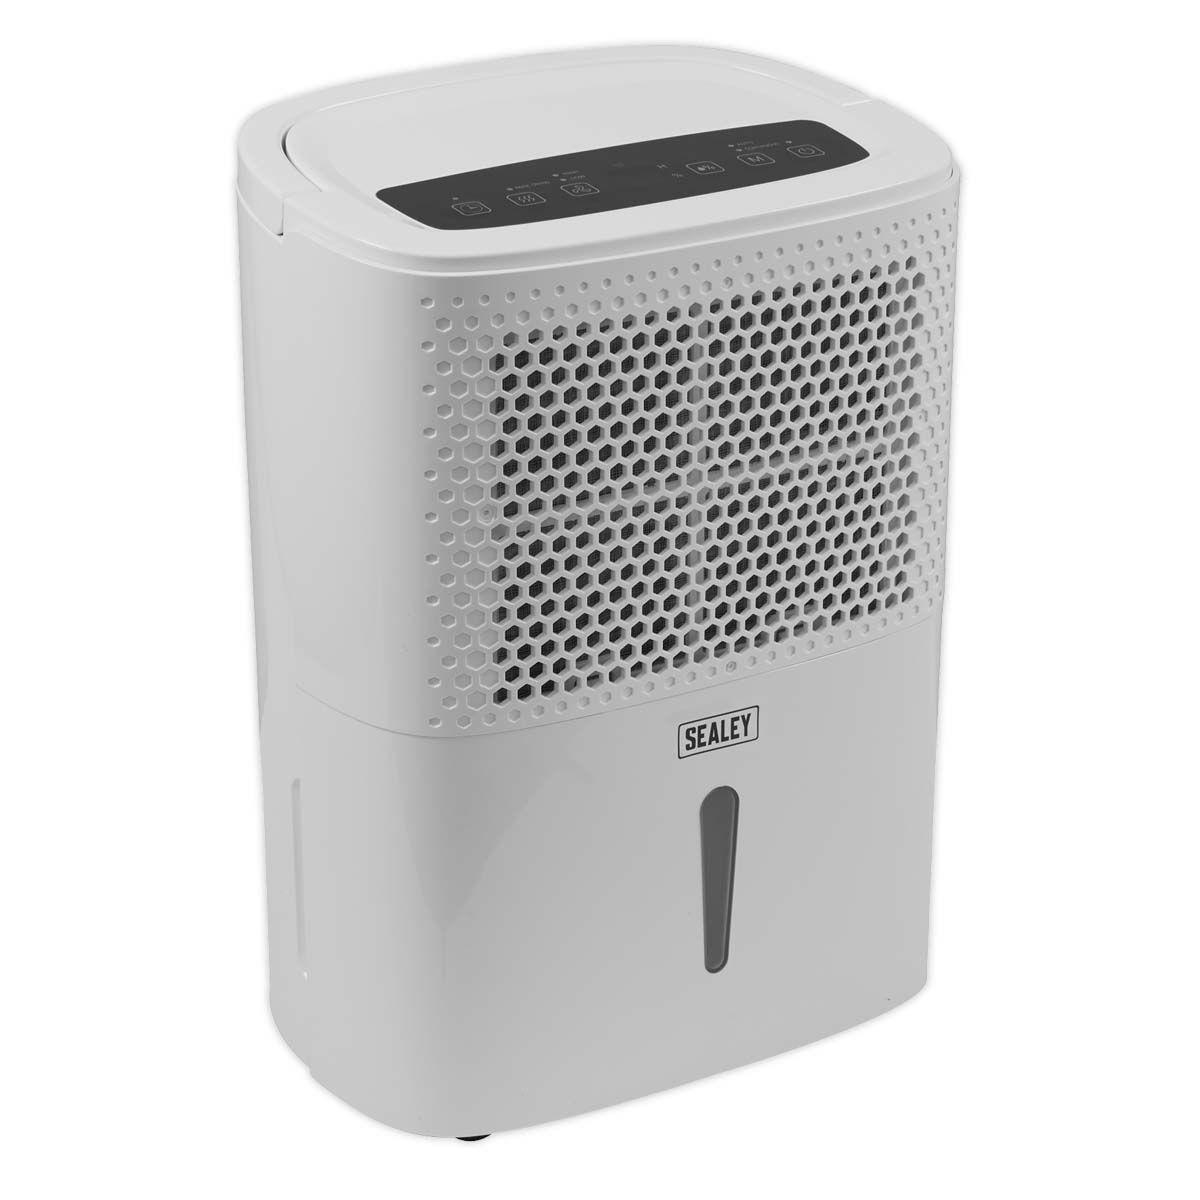 Sealey Dehumidifier 10L